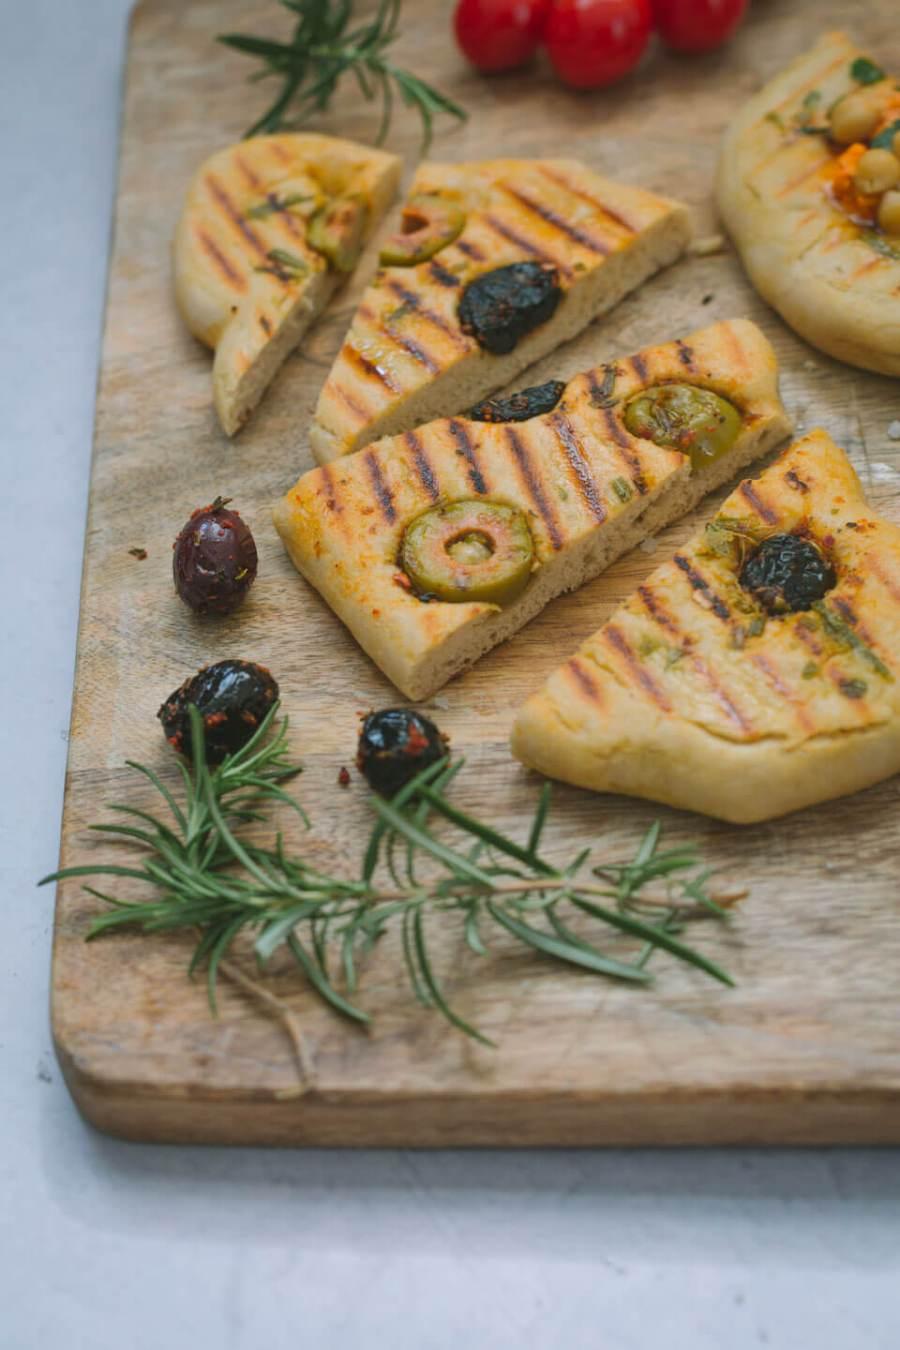 Grillbrot mit Oliven